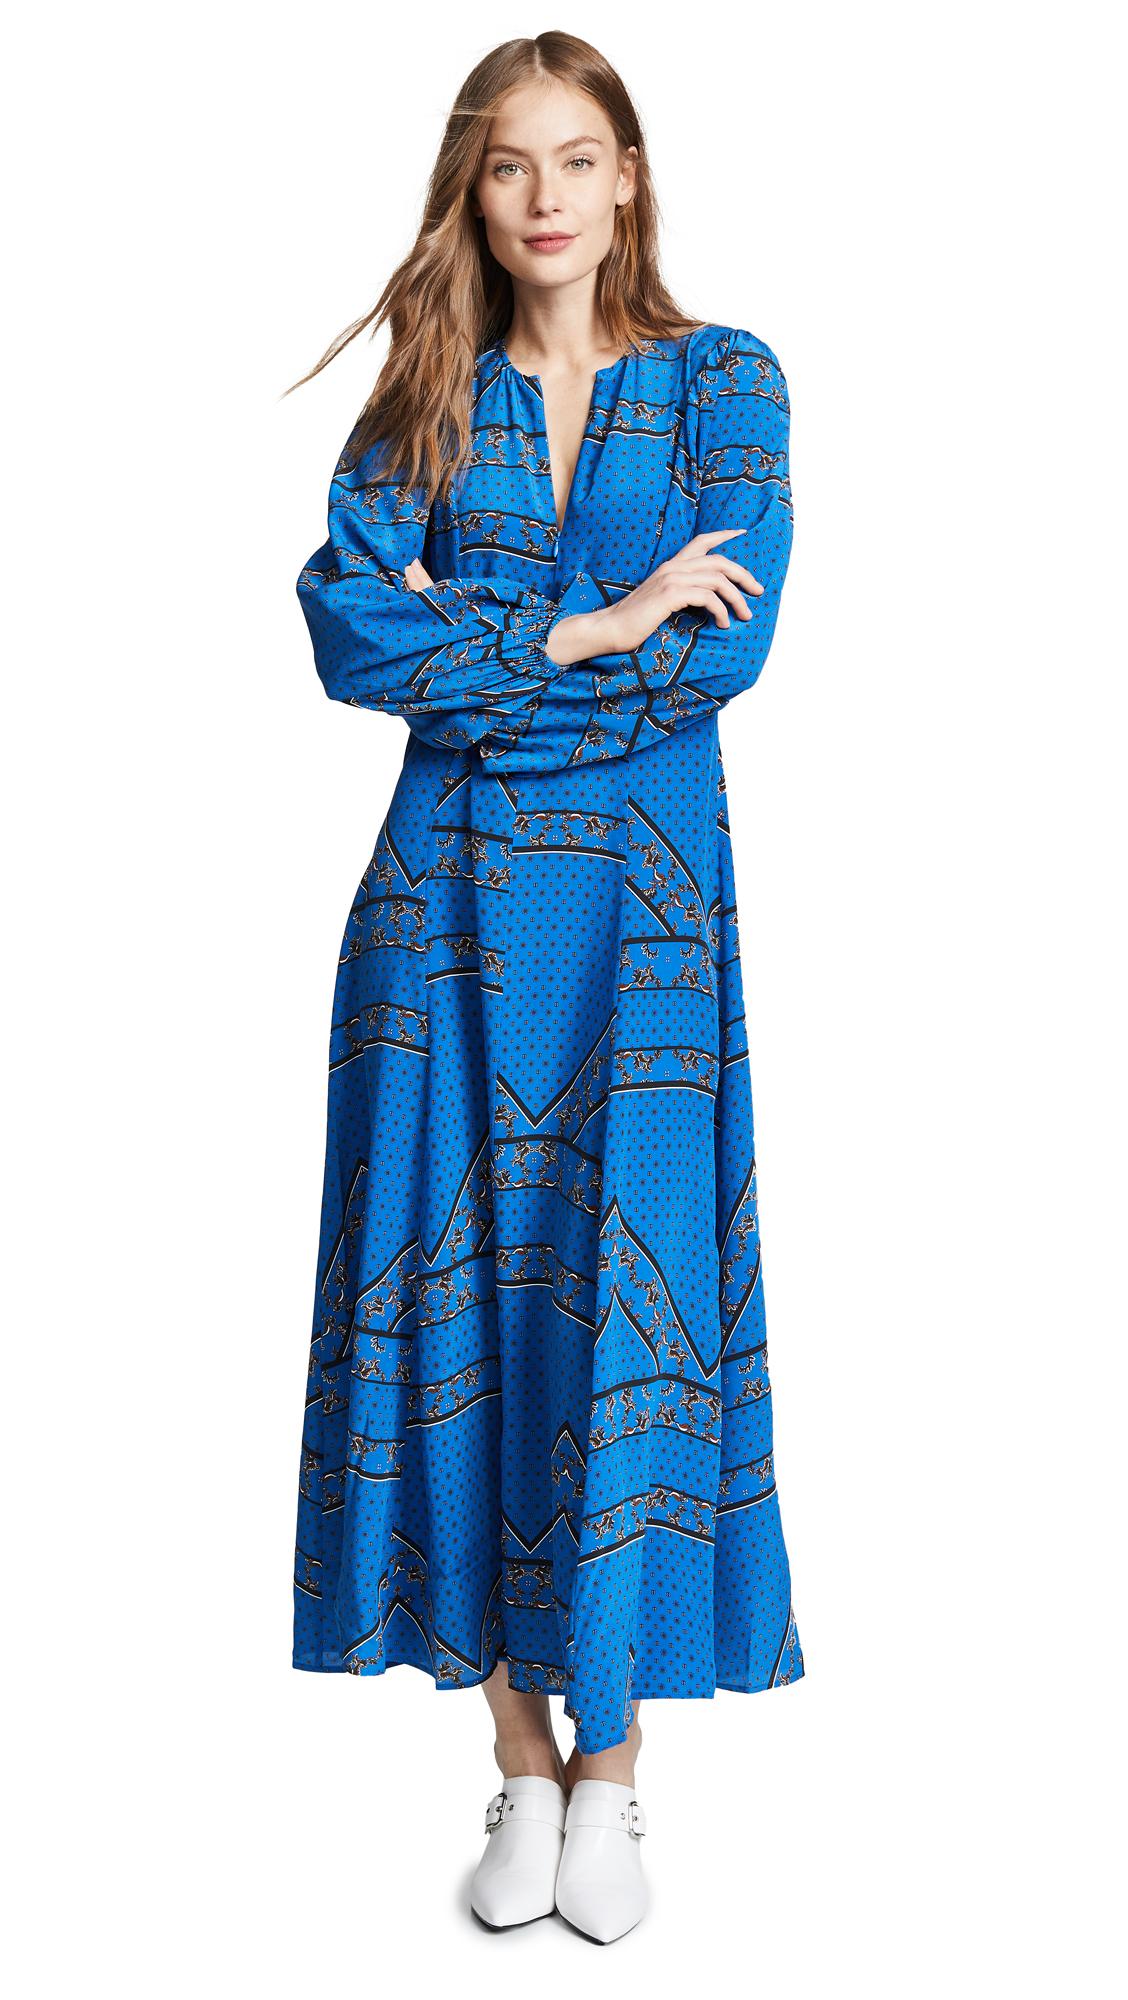 8b609250 Ganni Cloverdale Floral-Print Silk-Crepe Midi Dress In 593 Lapis Blue